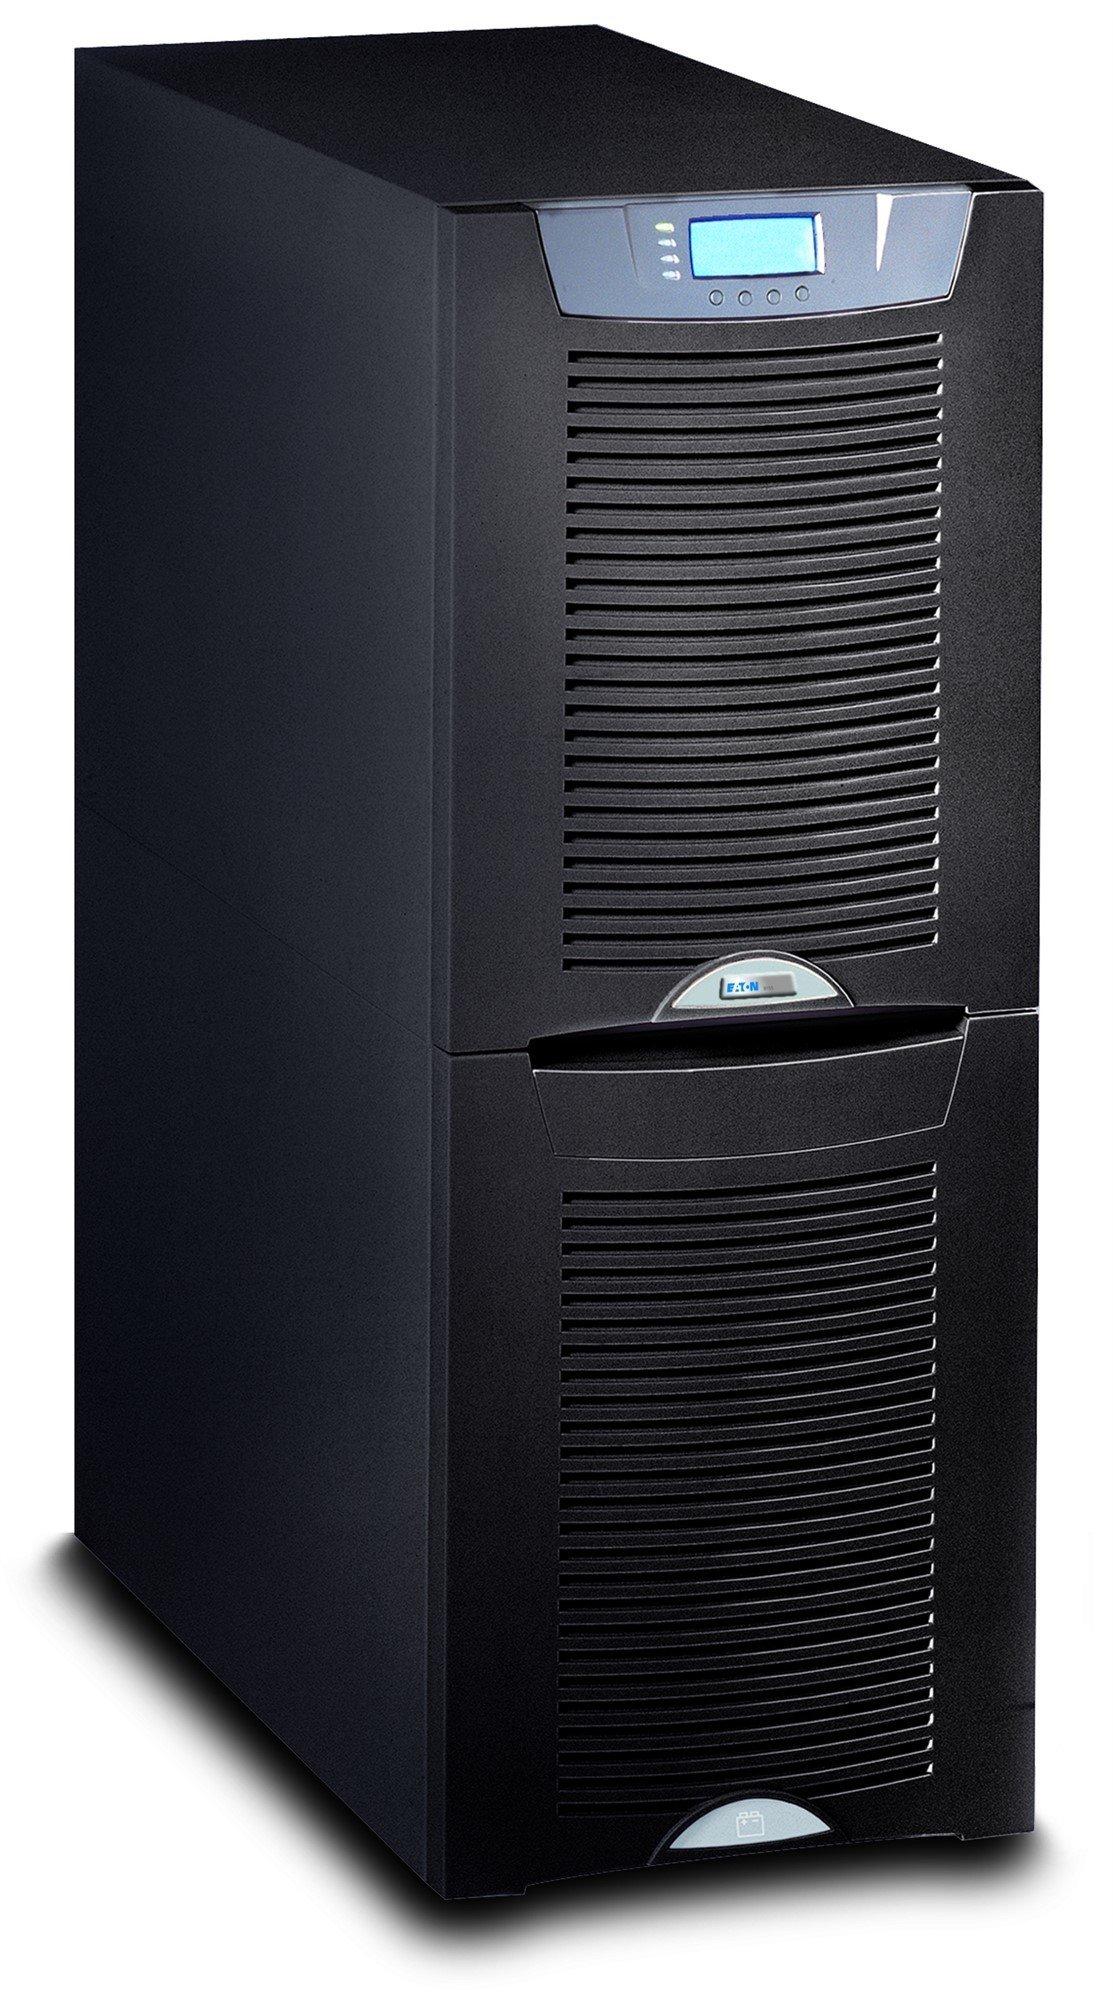 An image of Eaton powerware 9155-12-nlhs-15-64x7ah uninterruptible power supply (ups) 12000 ...